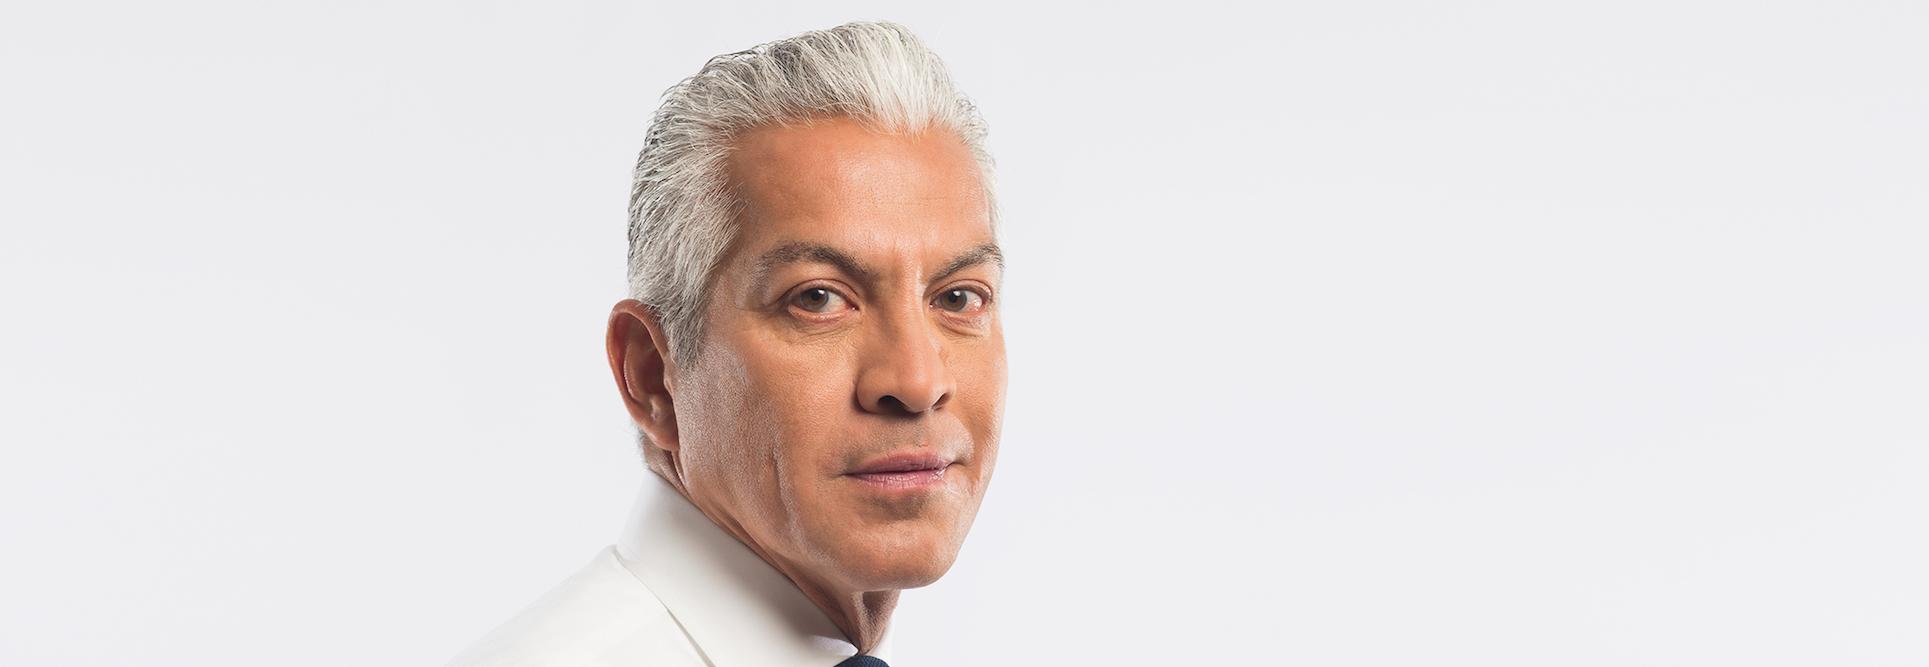 USHCC dismisses Palomarez